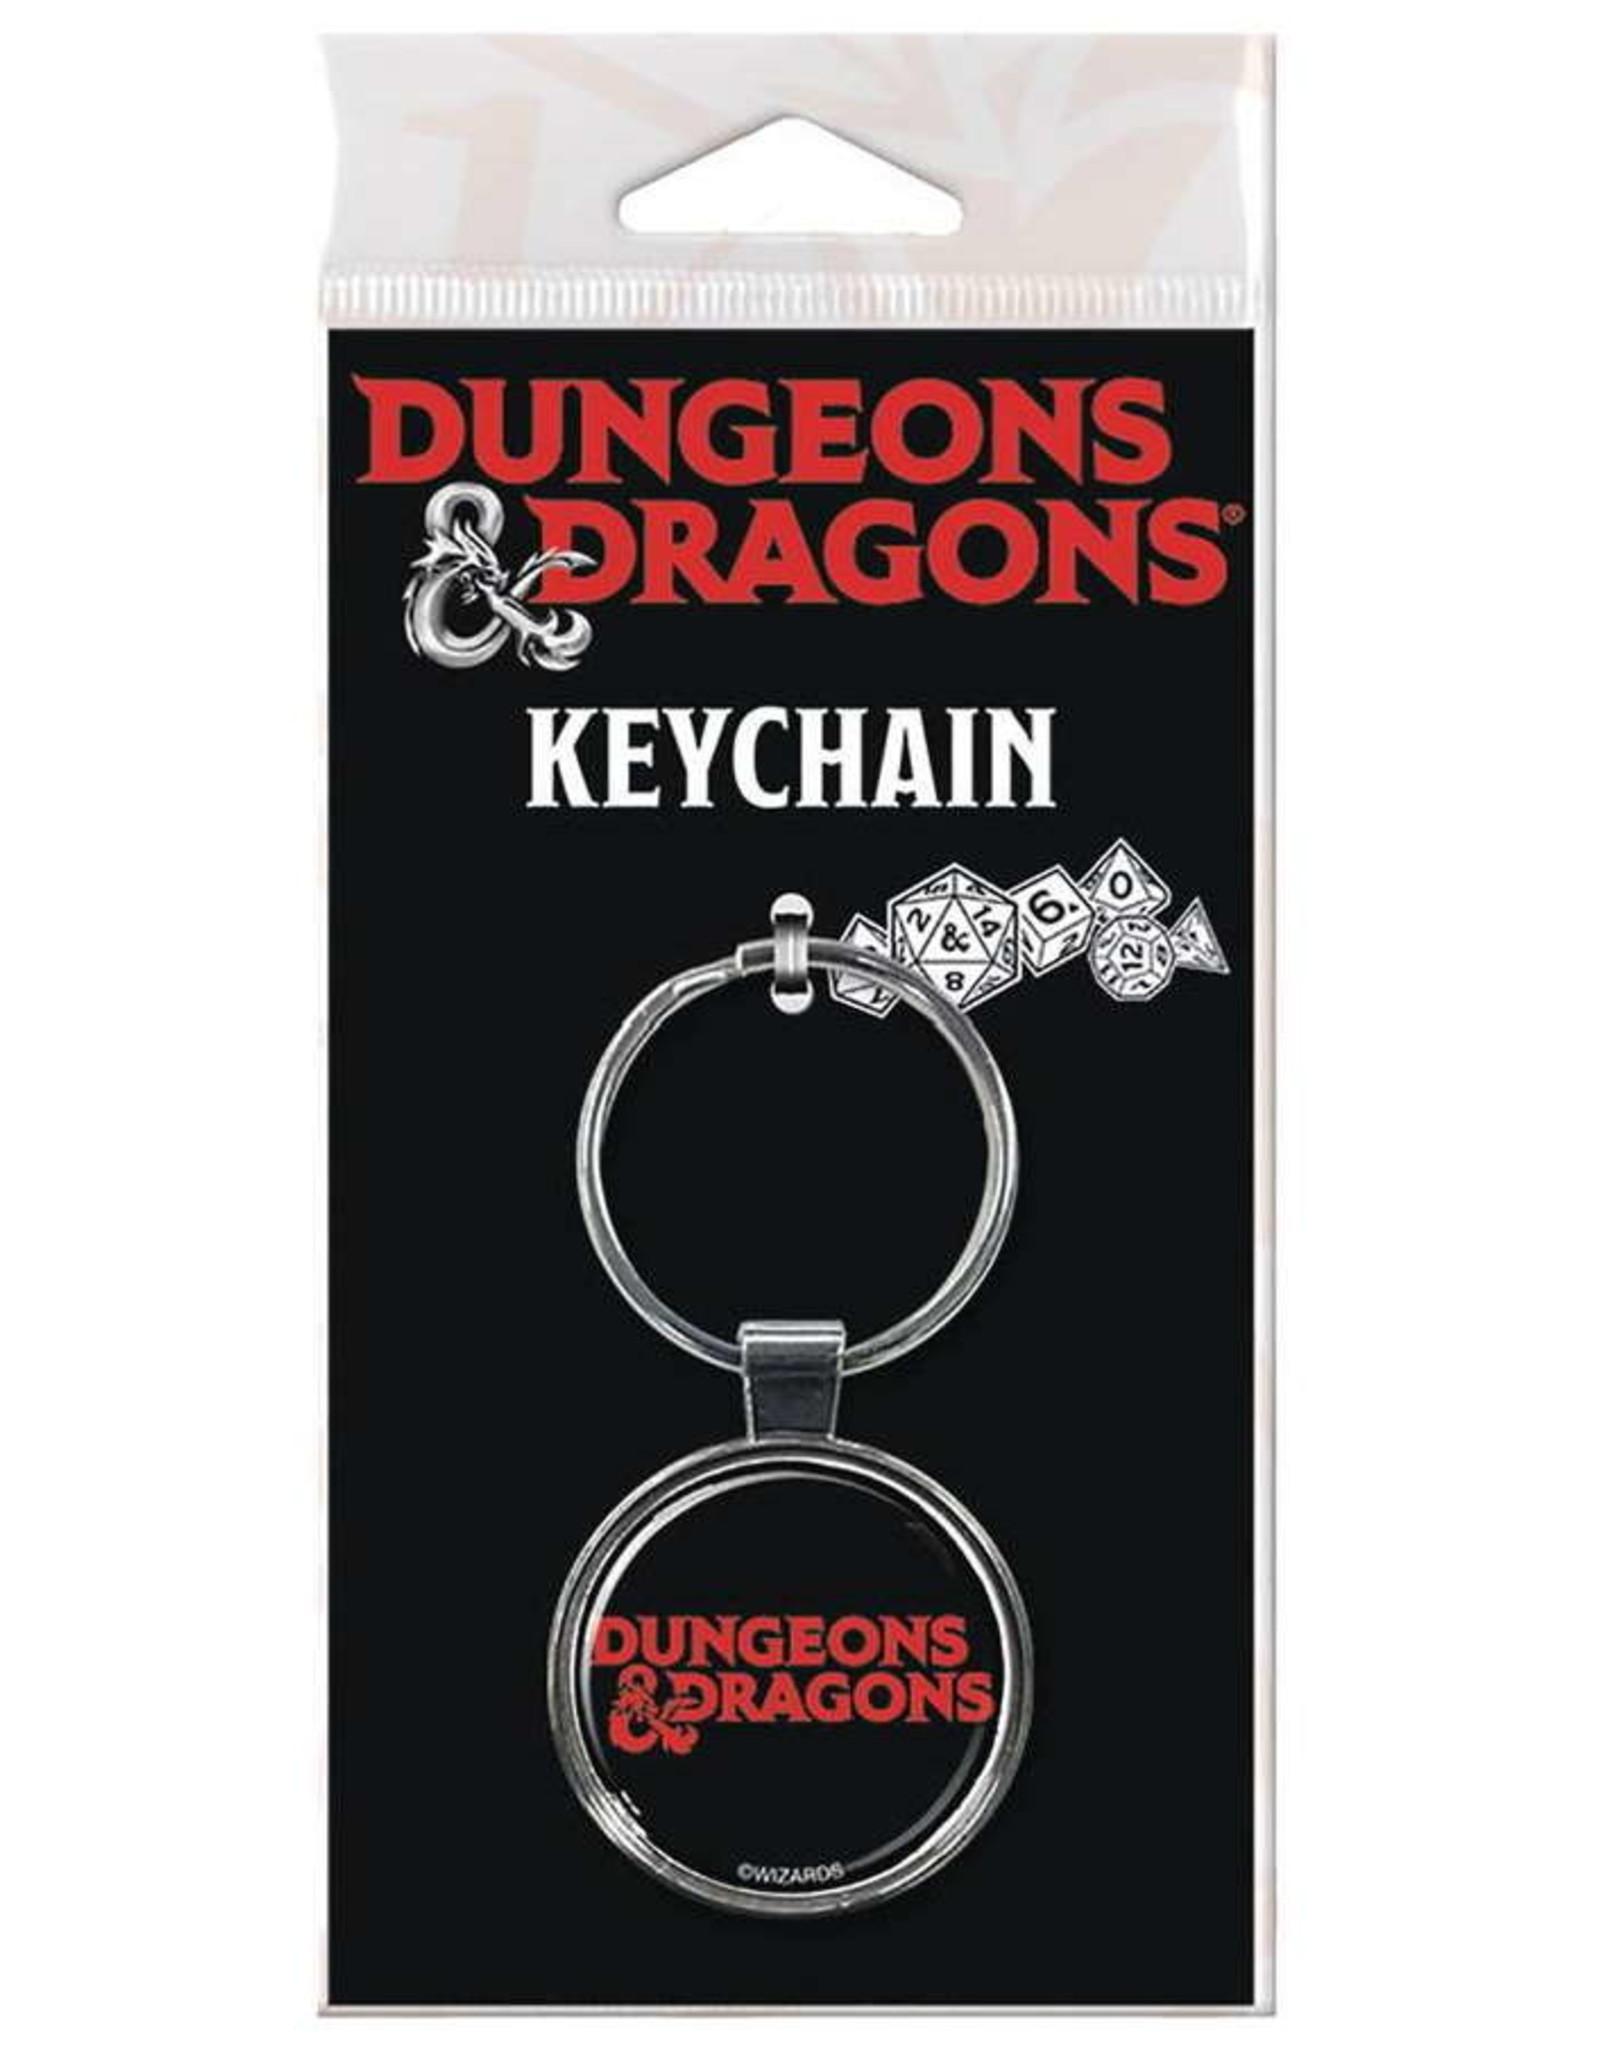 DUNGEONS & DRAGONS KEYCHAIN LOGO